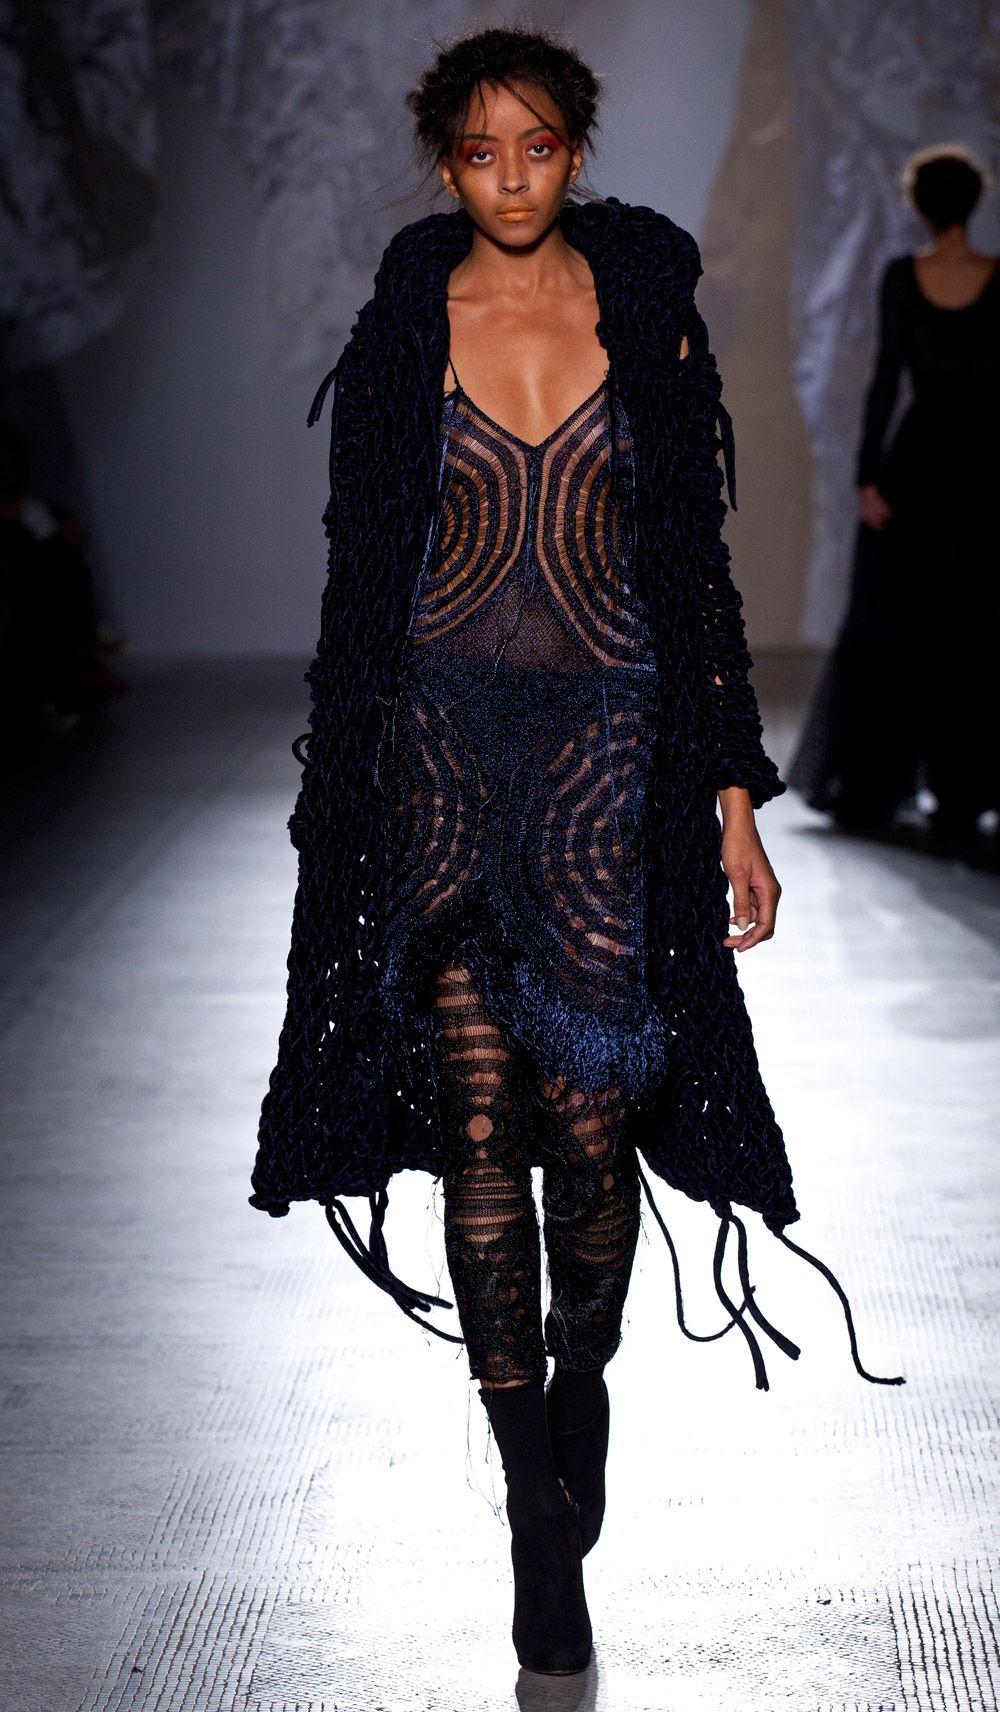 Fashion in Motion: Craig Lawrence 2012 VAM